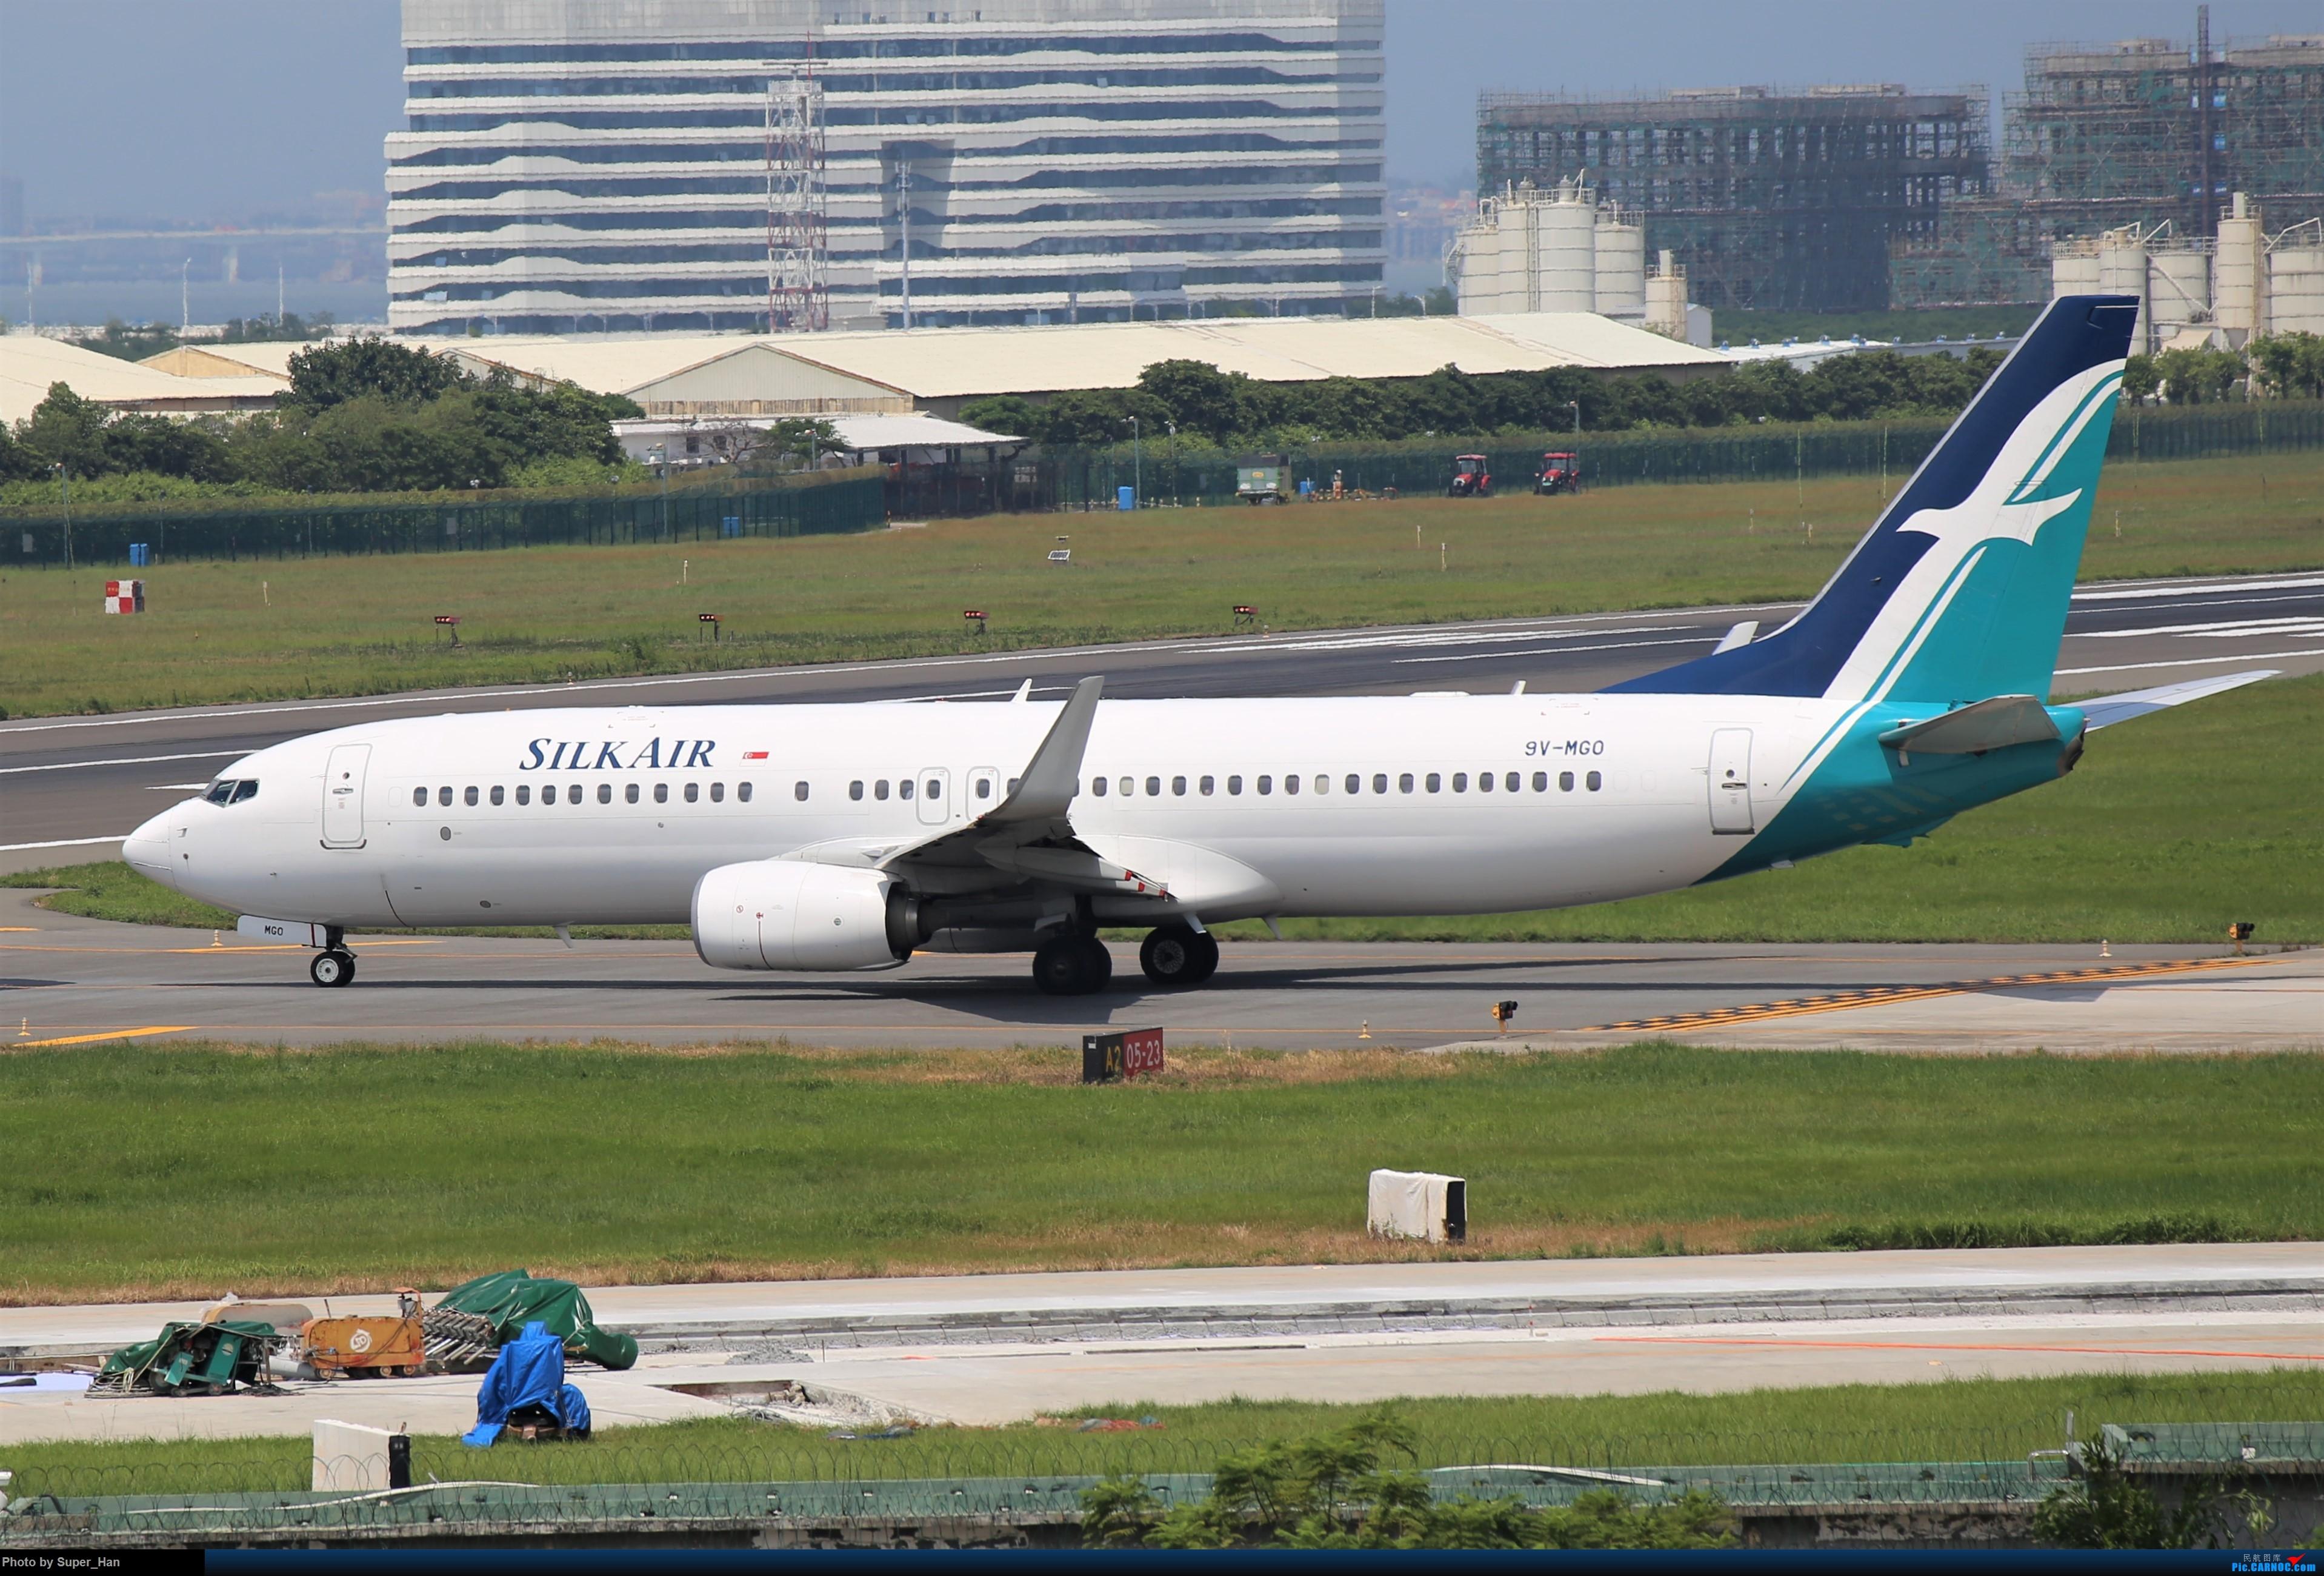 Re:[原创]0831初访XMN BOEING 737-800 9V-MGO 中国厦门高崎国际机场